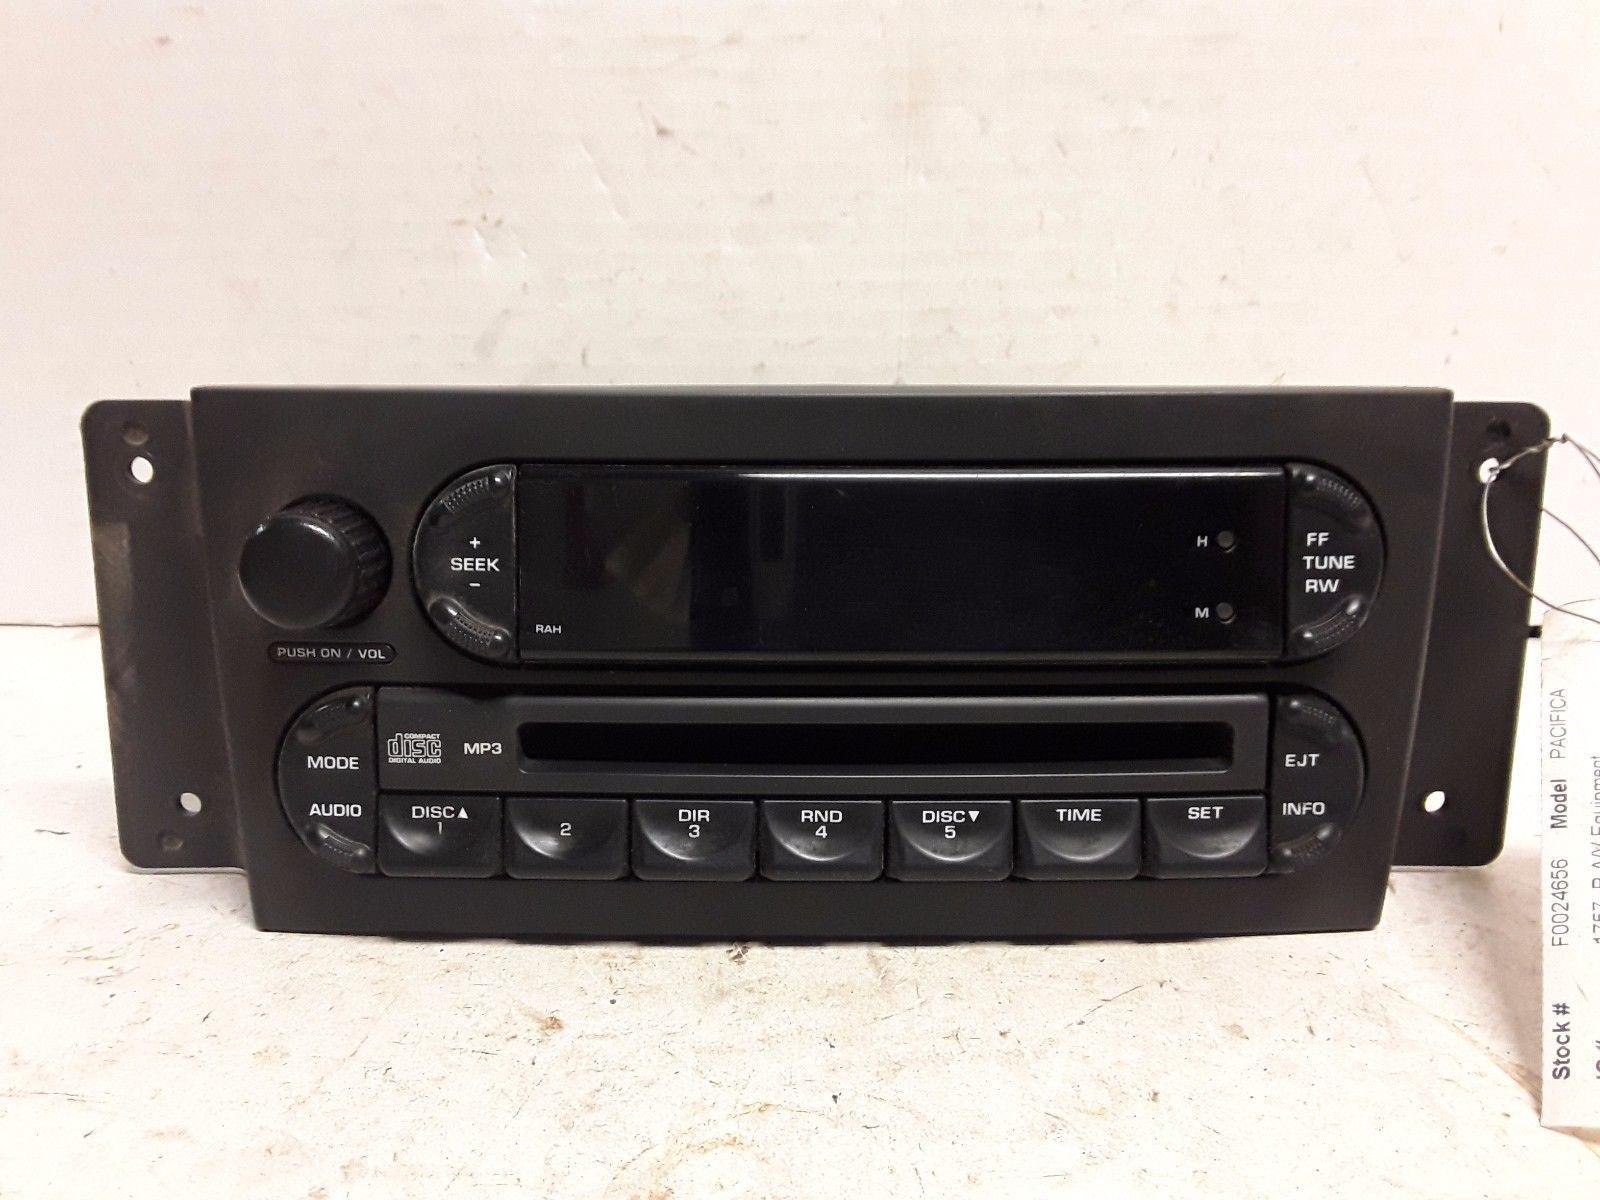 04 05 06 07 08 Chrysler Pacifica AM FM CD radio receiver OEM P05094564AC  RAH